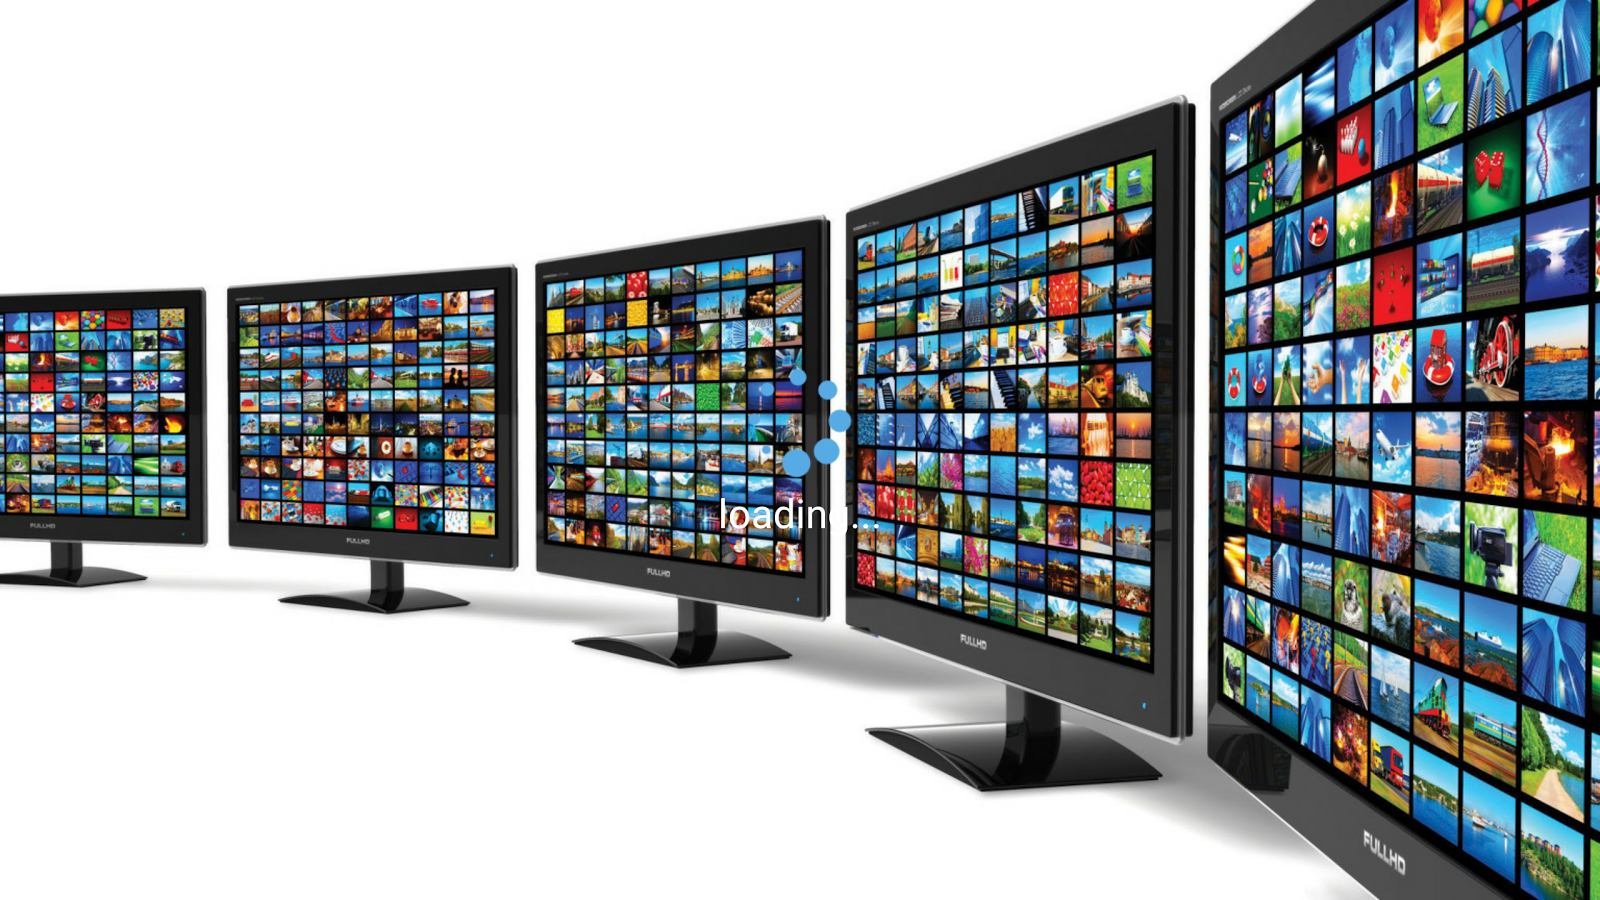 IPTV Echoo TVBOX 1 2 8 APK Download - Android Entertainment Apps